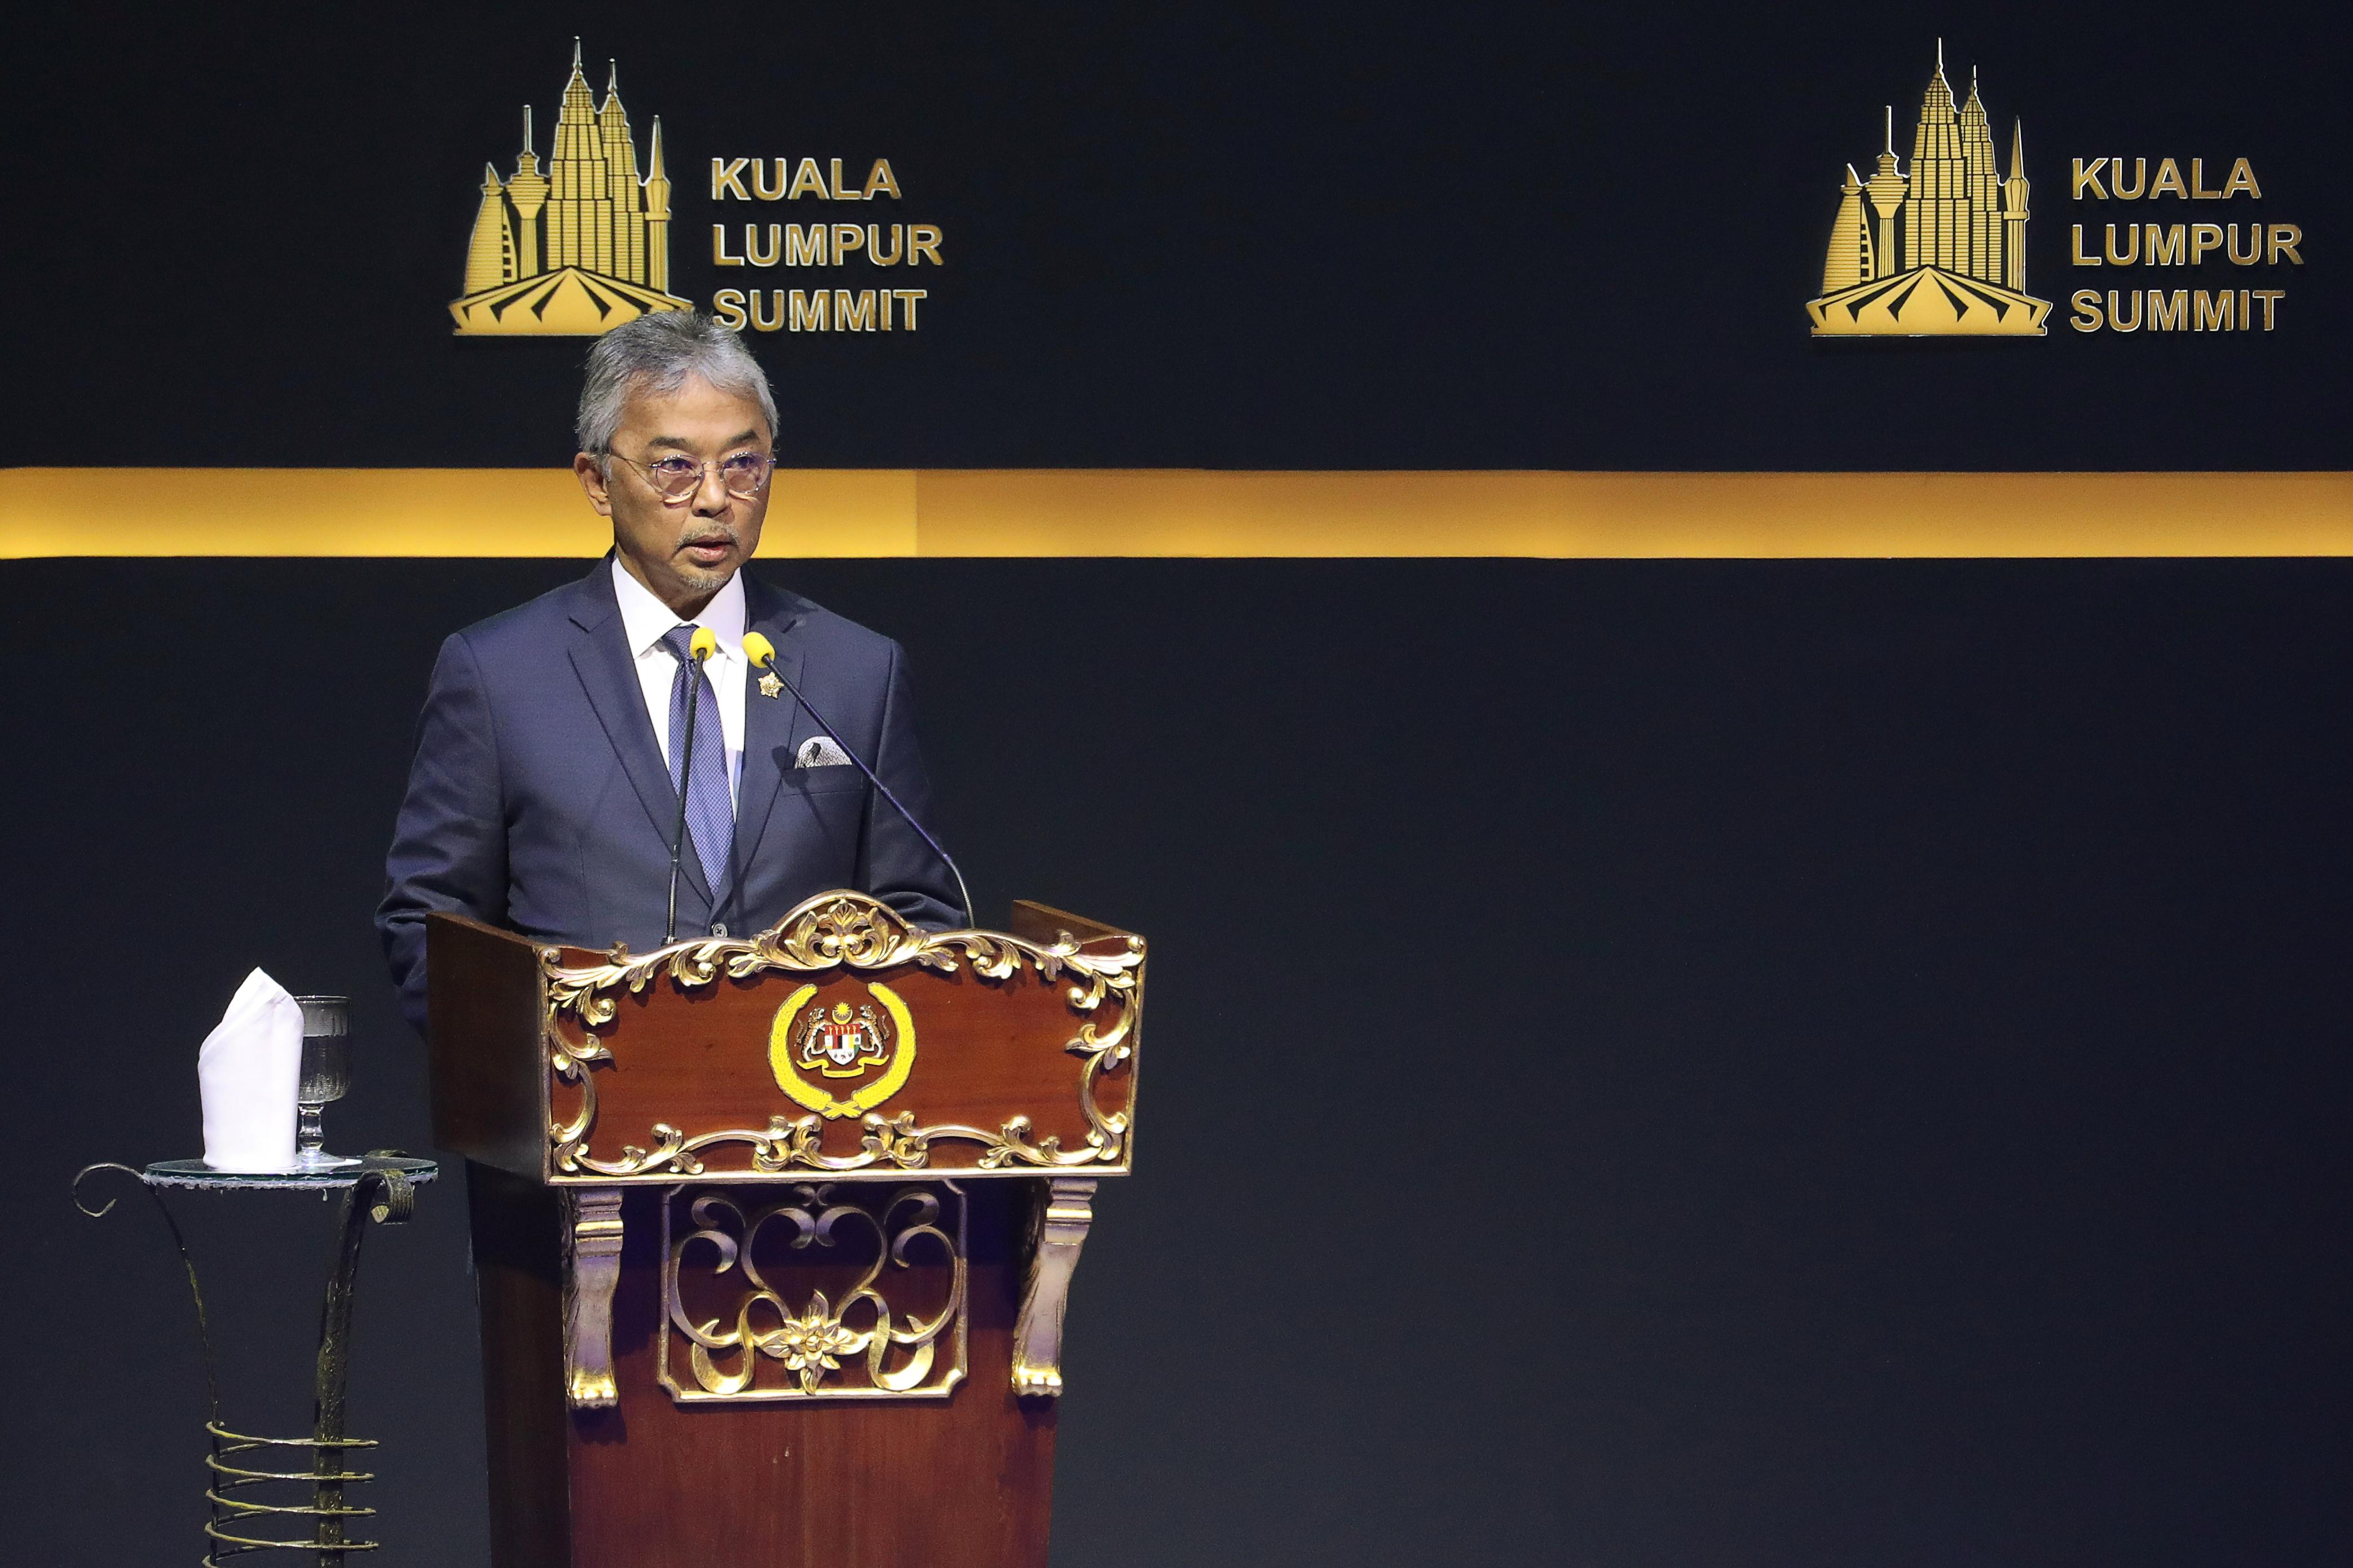 Malaysia's King Sultan Abdullah Sultan Ahmad Shah speaks during Kuala Lumpur Summit in Kuala Lumpur, Malaysia, December 19, 2019. REUTERS/Lim Huey Teng